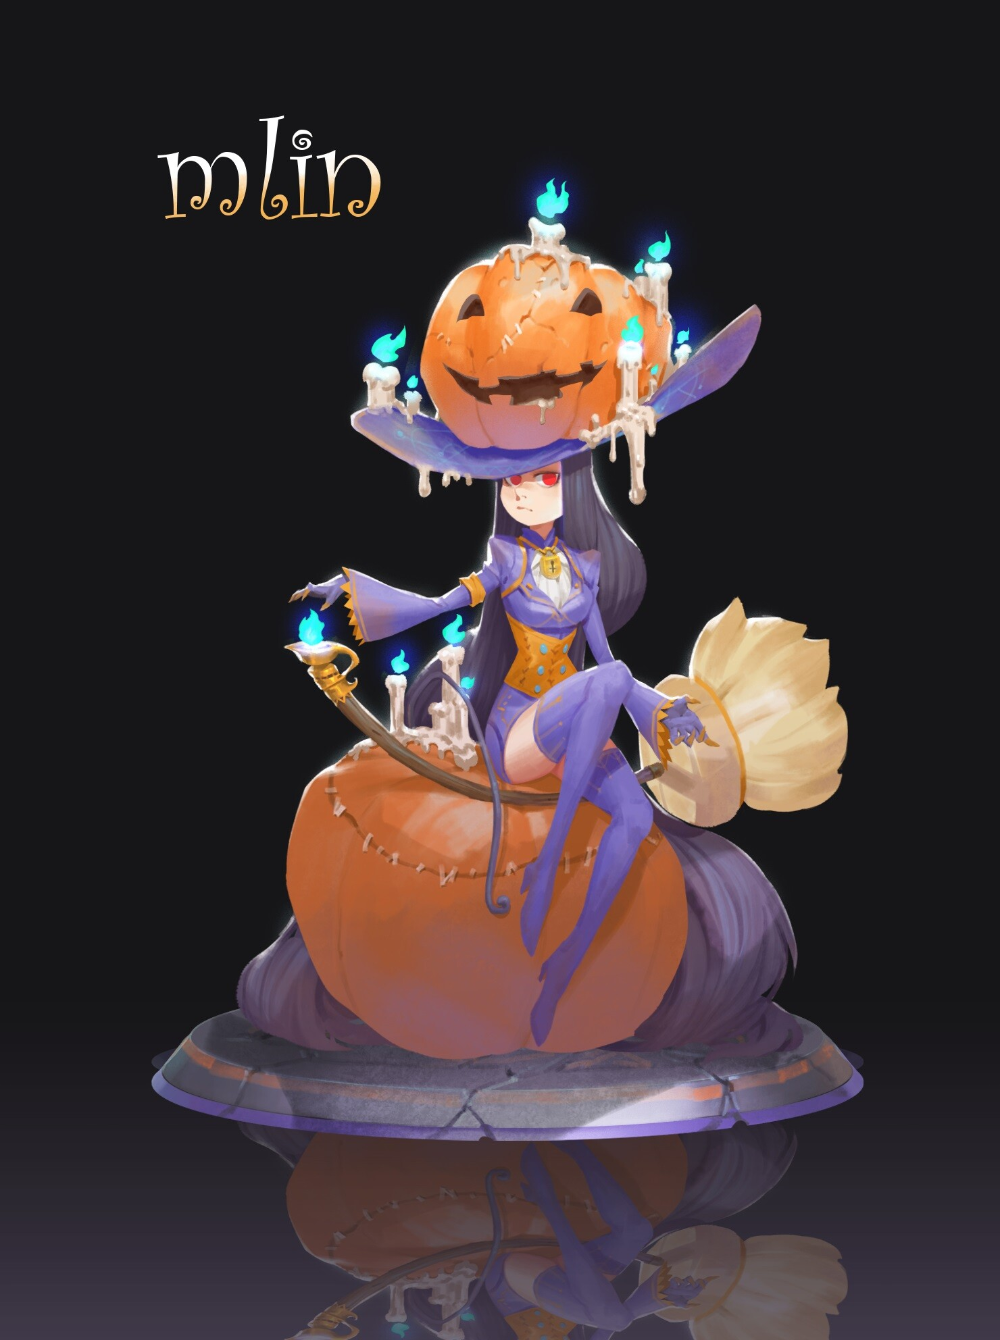 ArtStation Magical girl, zexi guo in 2020 Magical girl